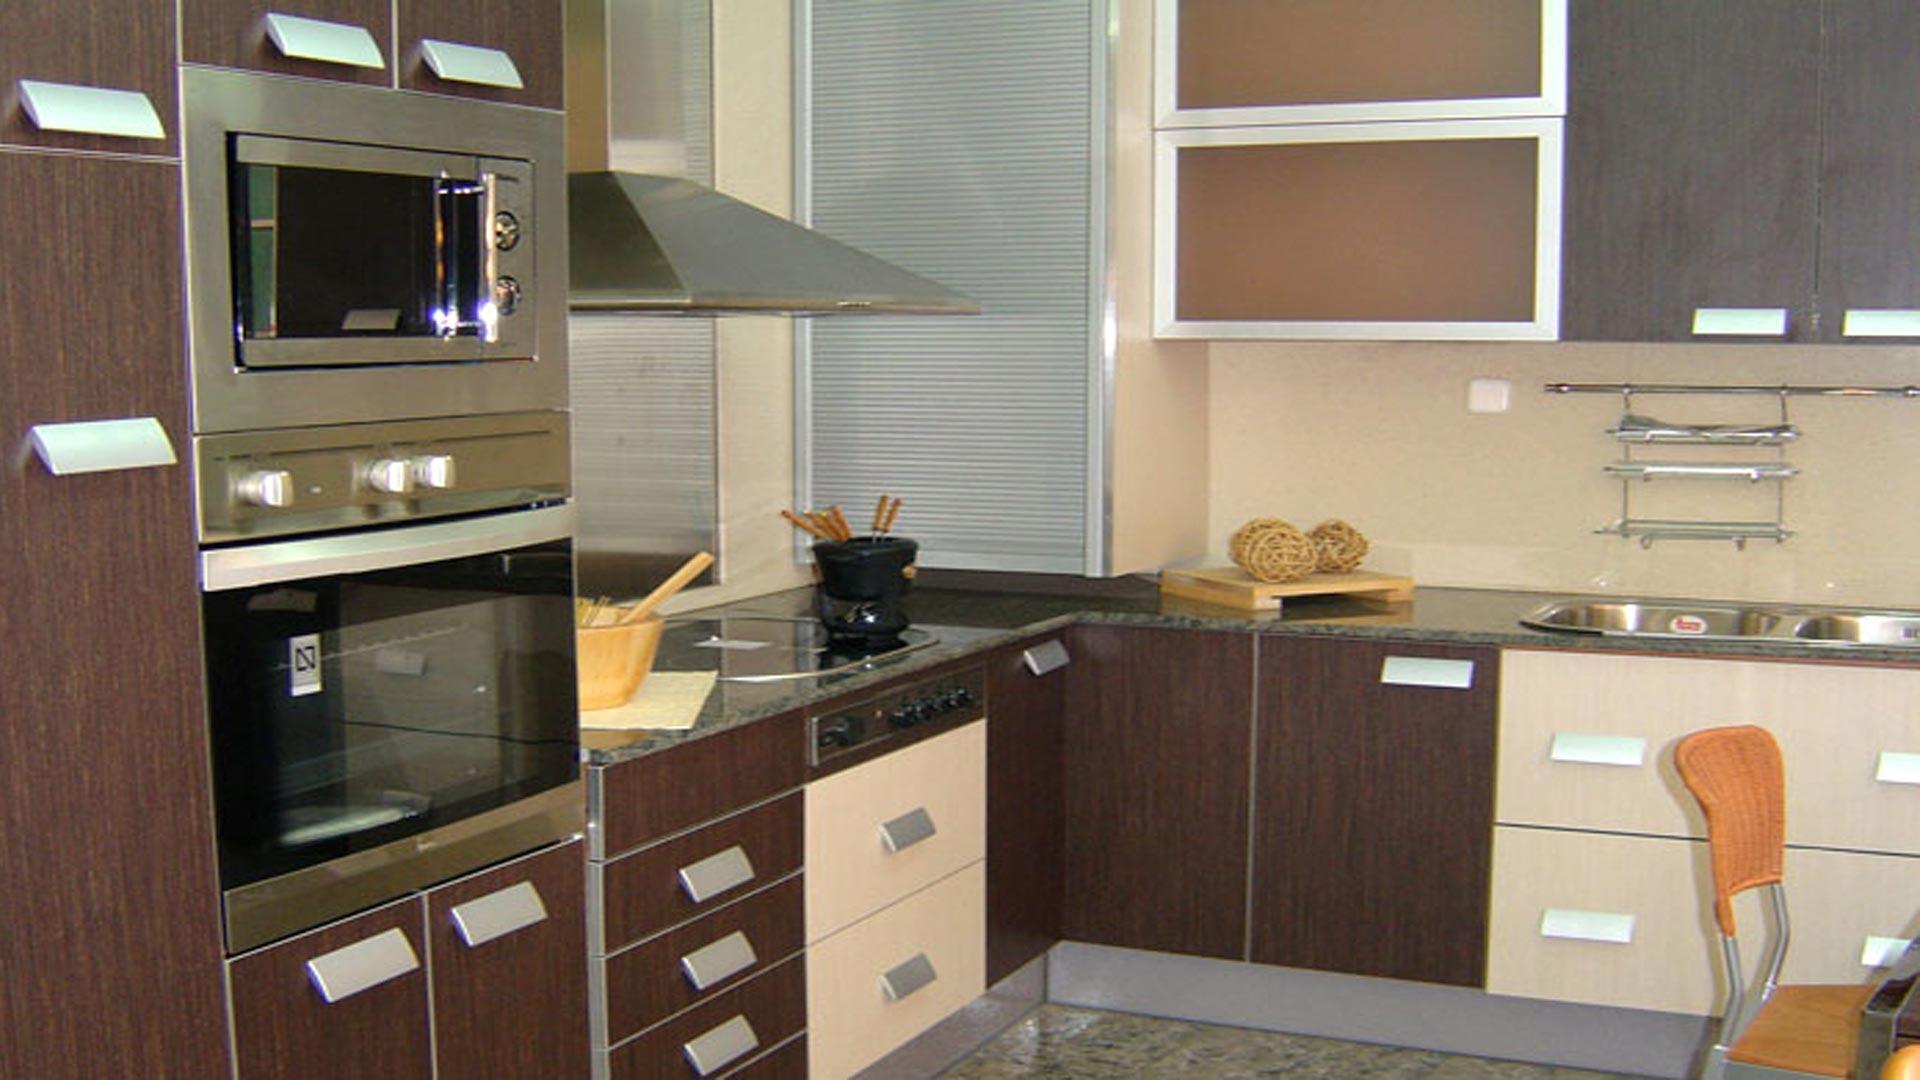 Renovar la cocina sin reformas - Renovar cocina sin obra ...